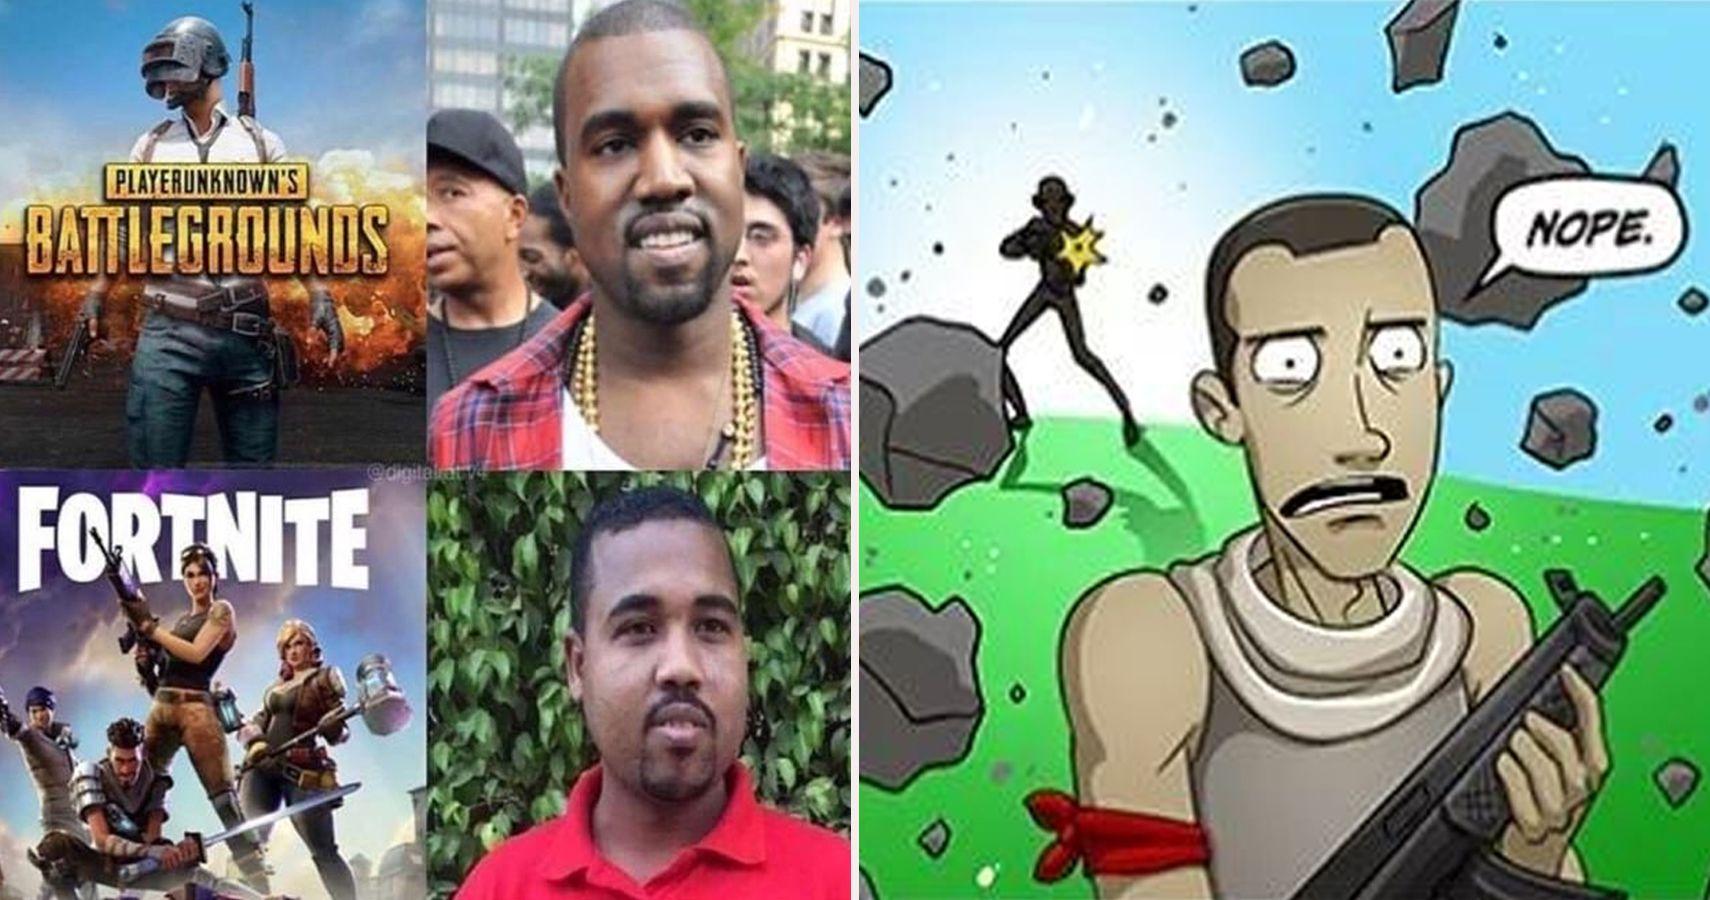 25 fortnite vs pubg meme comics that make fans choose a side